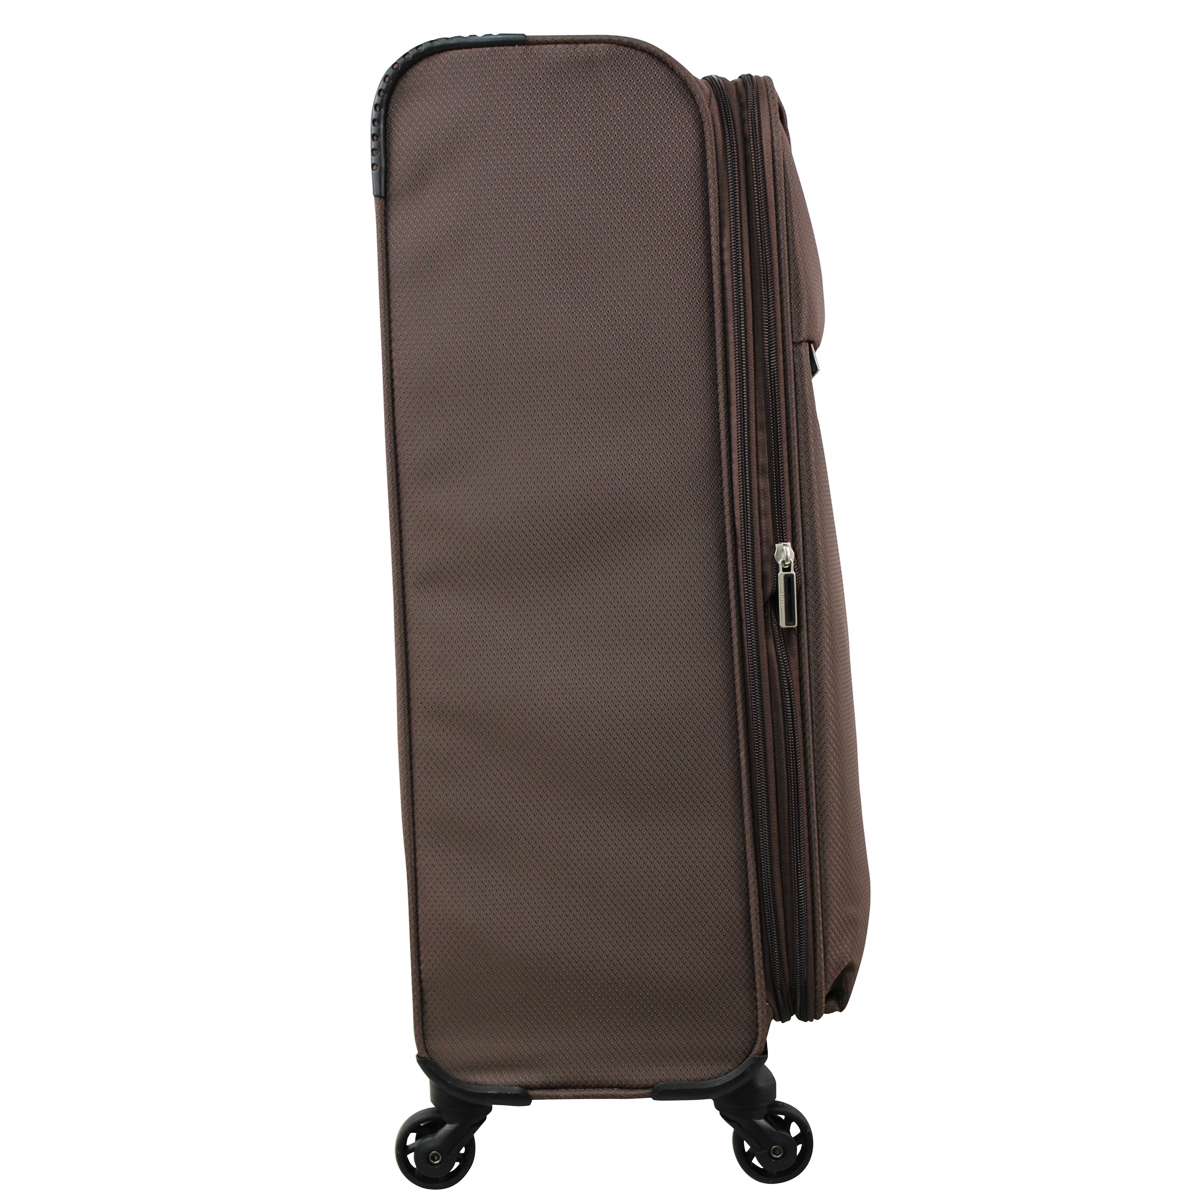 pack de 3 valises souples bagages pas cher. Black Bedroom Furniture Sets. Home Design Ideas